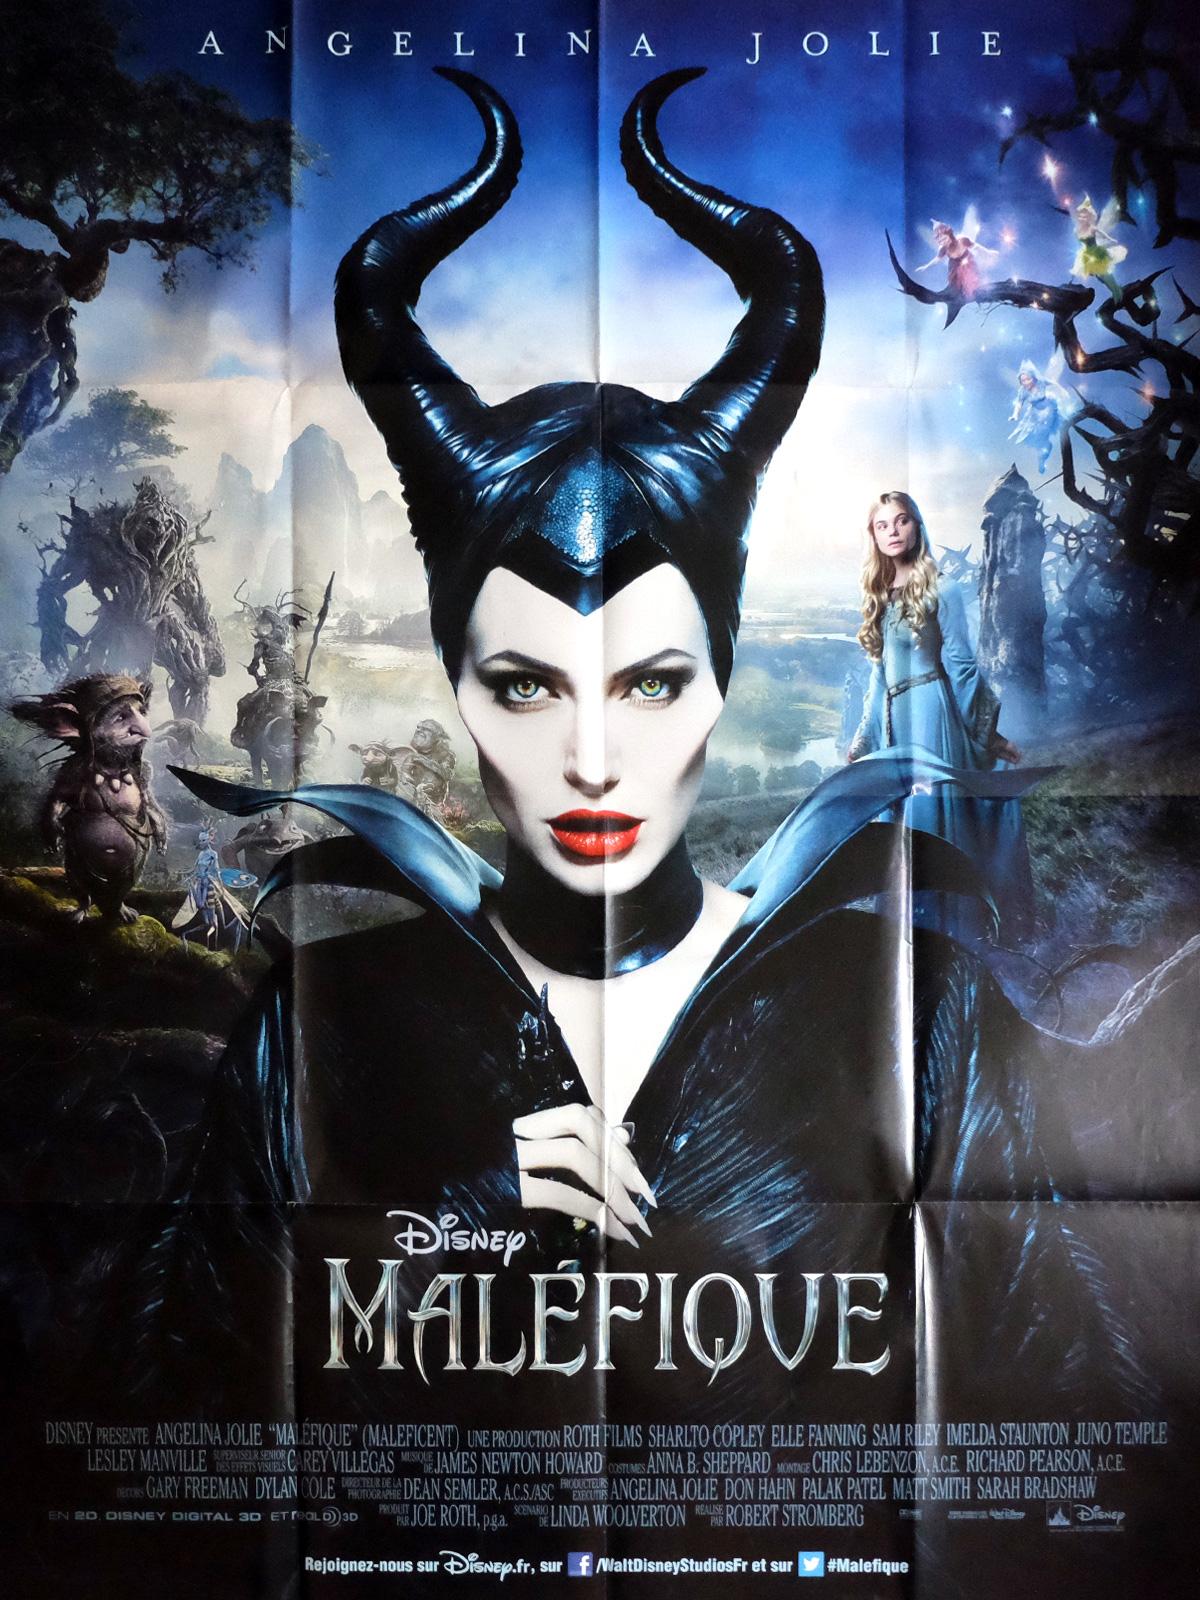 Maleficent Movie Poster 47x63 In 2014 Robert Stromberg Angelina Jolie